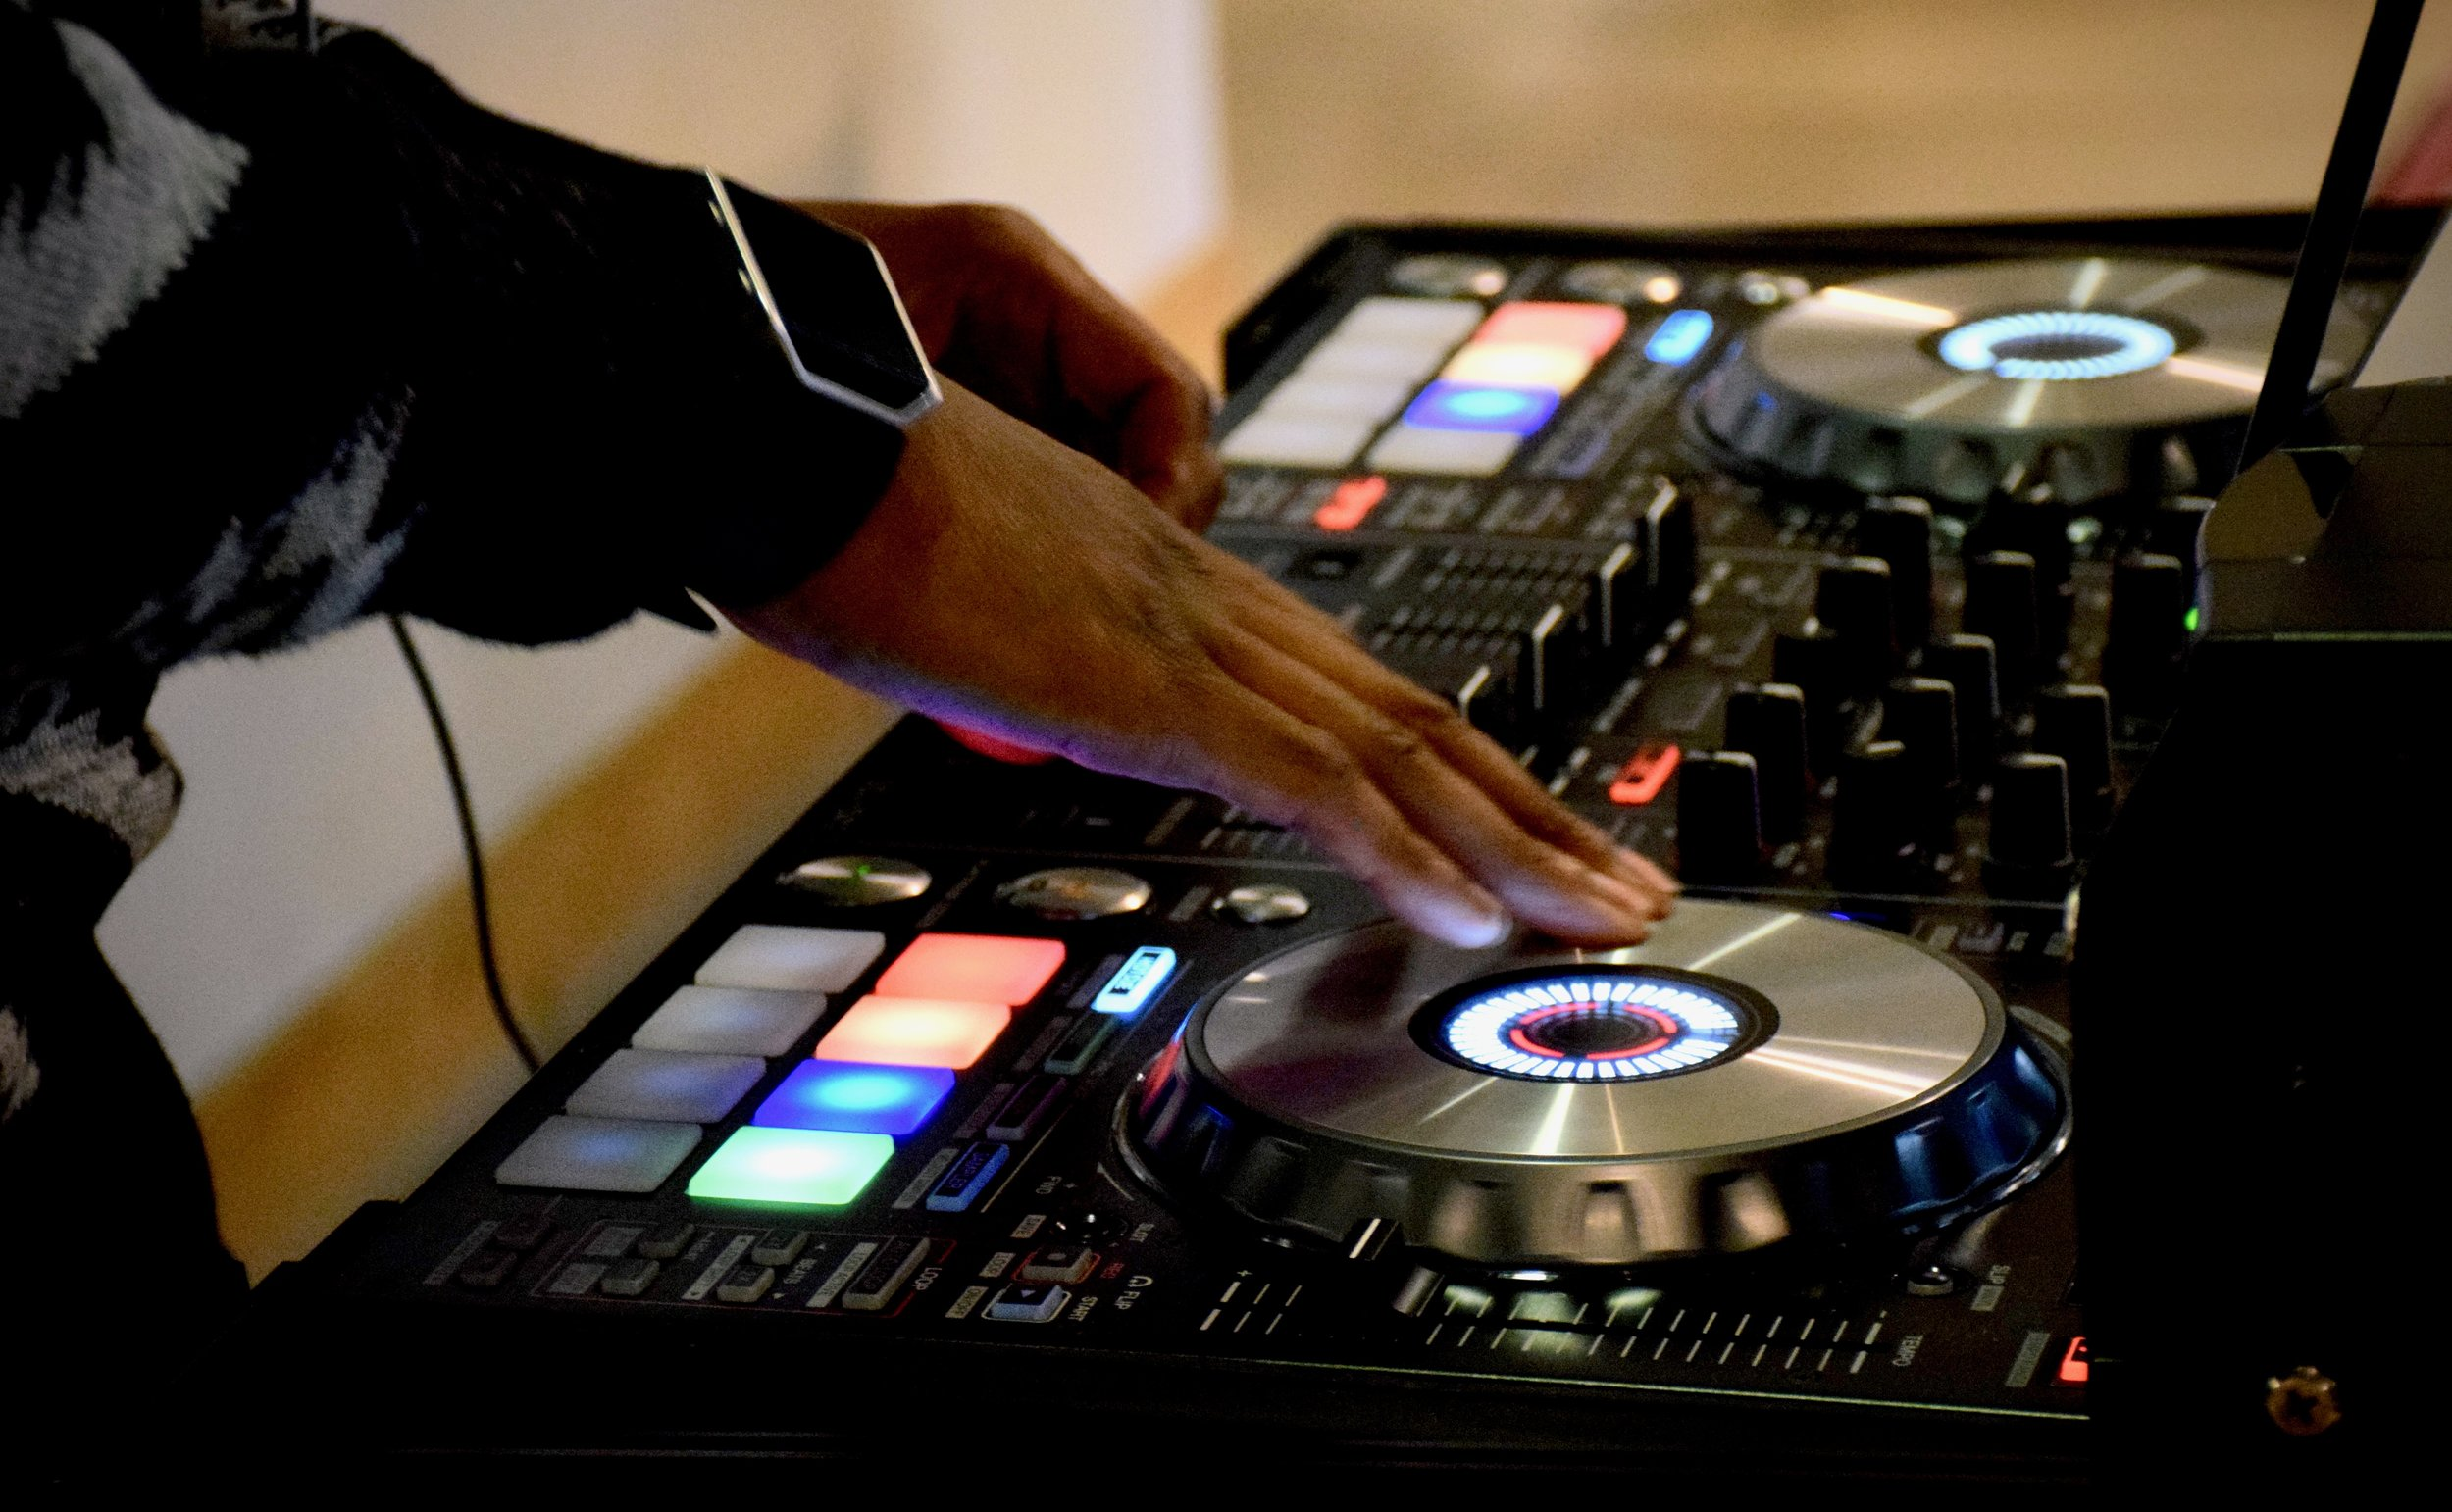 LIVE Reggae DJ - Mixin' up Reggae tunes!